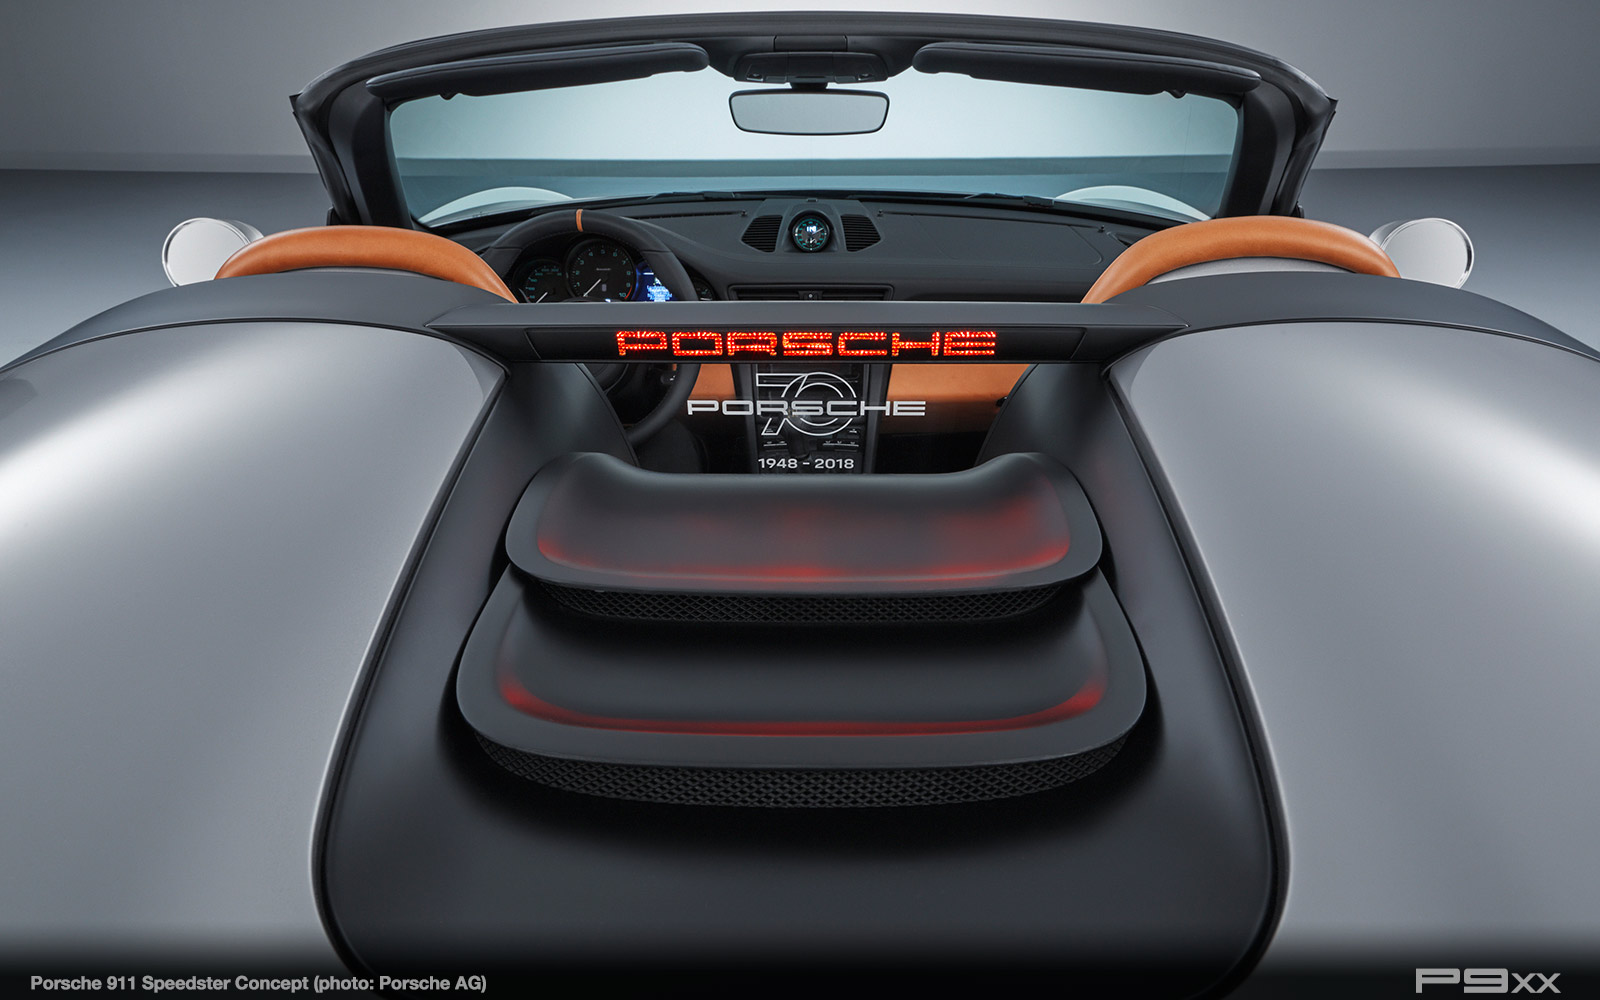 Porsche-911-Speedster-Concept-2018-303